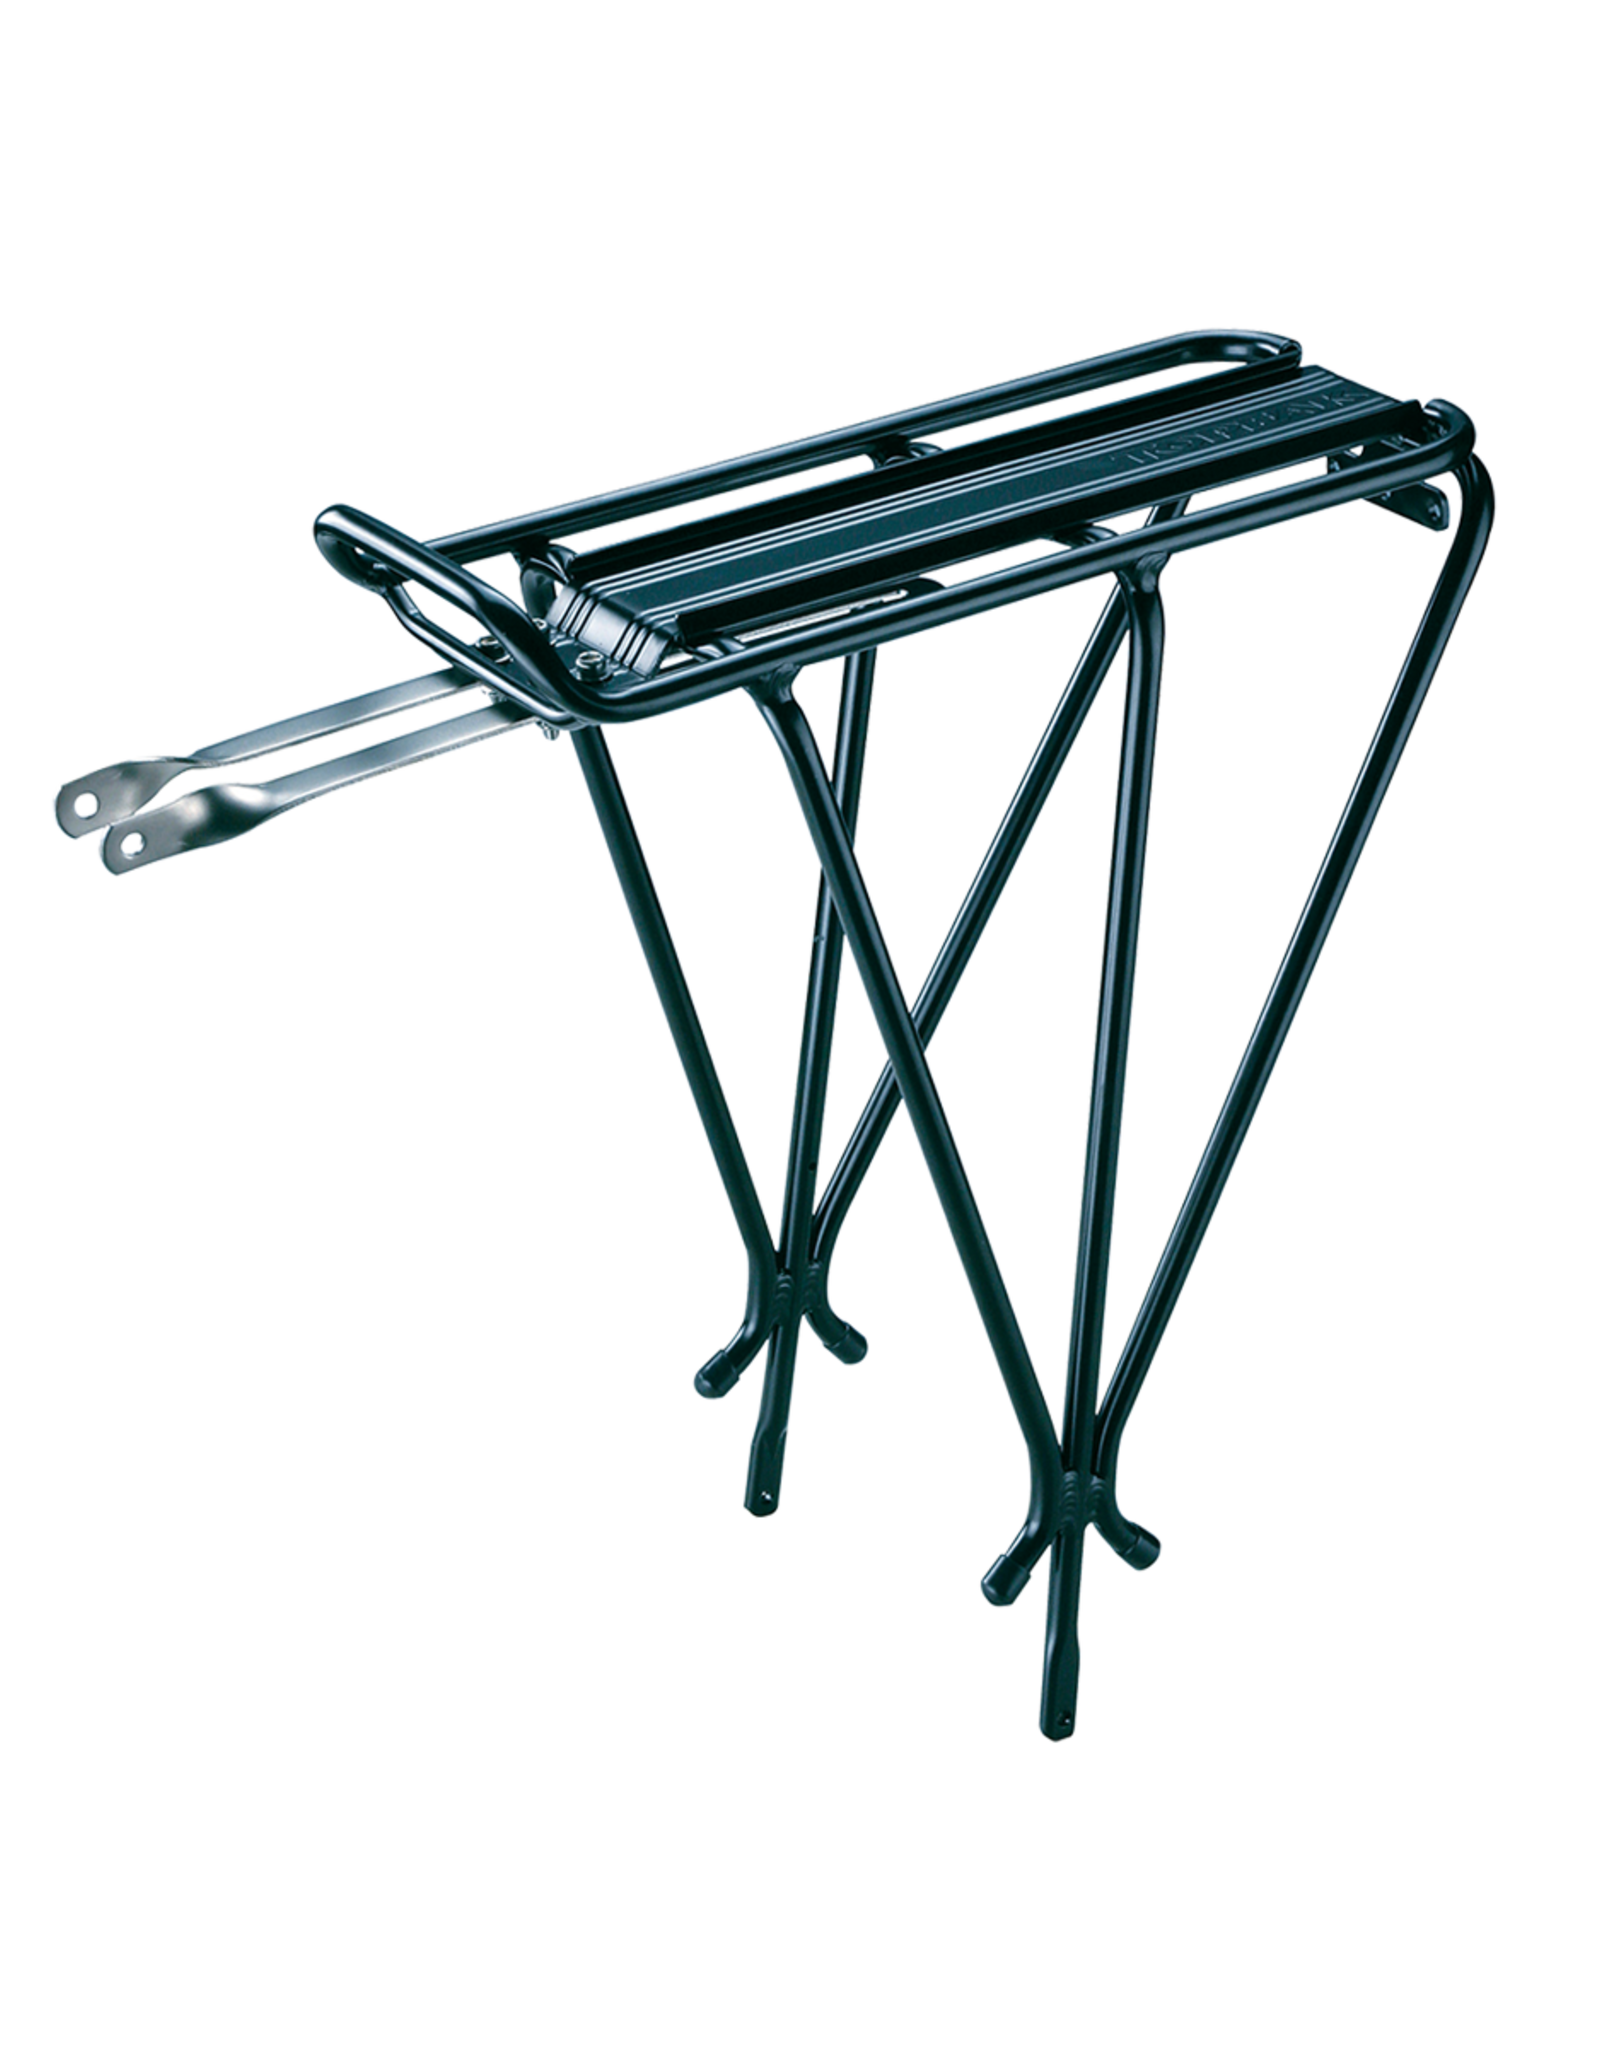 Rack - Topeak Explorer Rear Rack Black Fits MTX Trunk Bags (Non-disc, no spring clip)